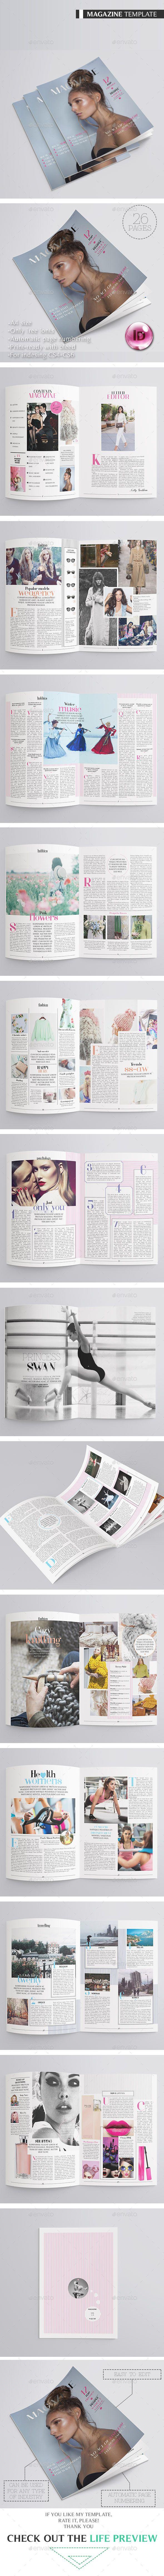 Fashion Magazine 26 Pages